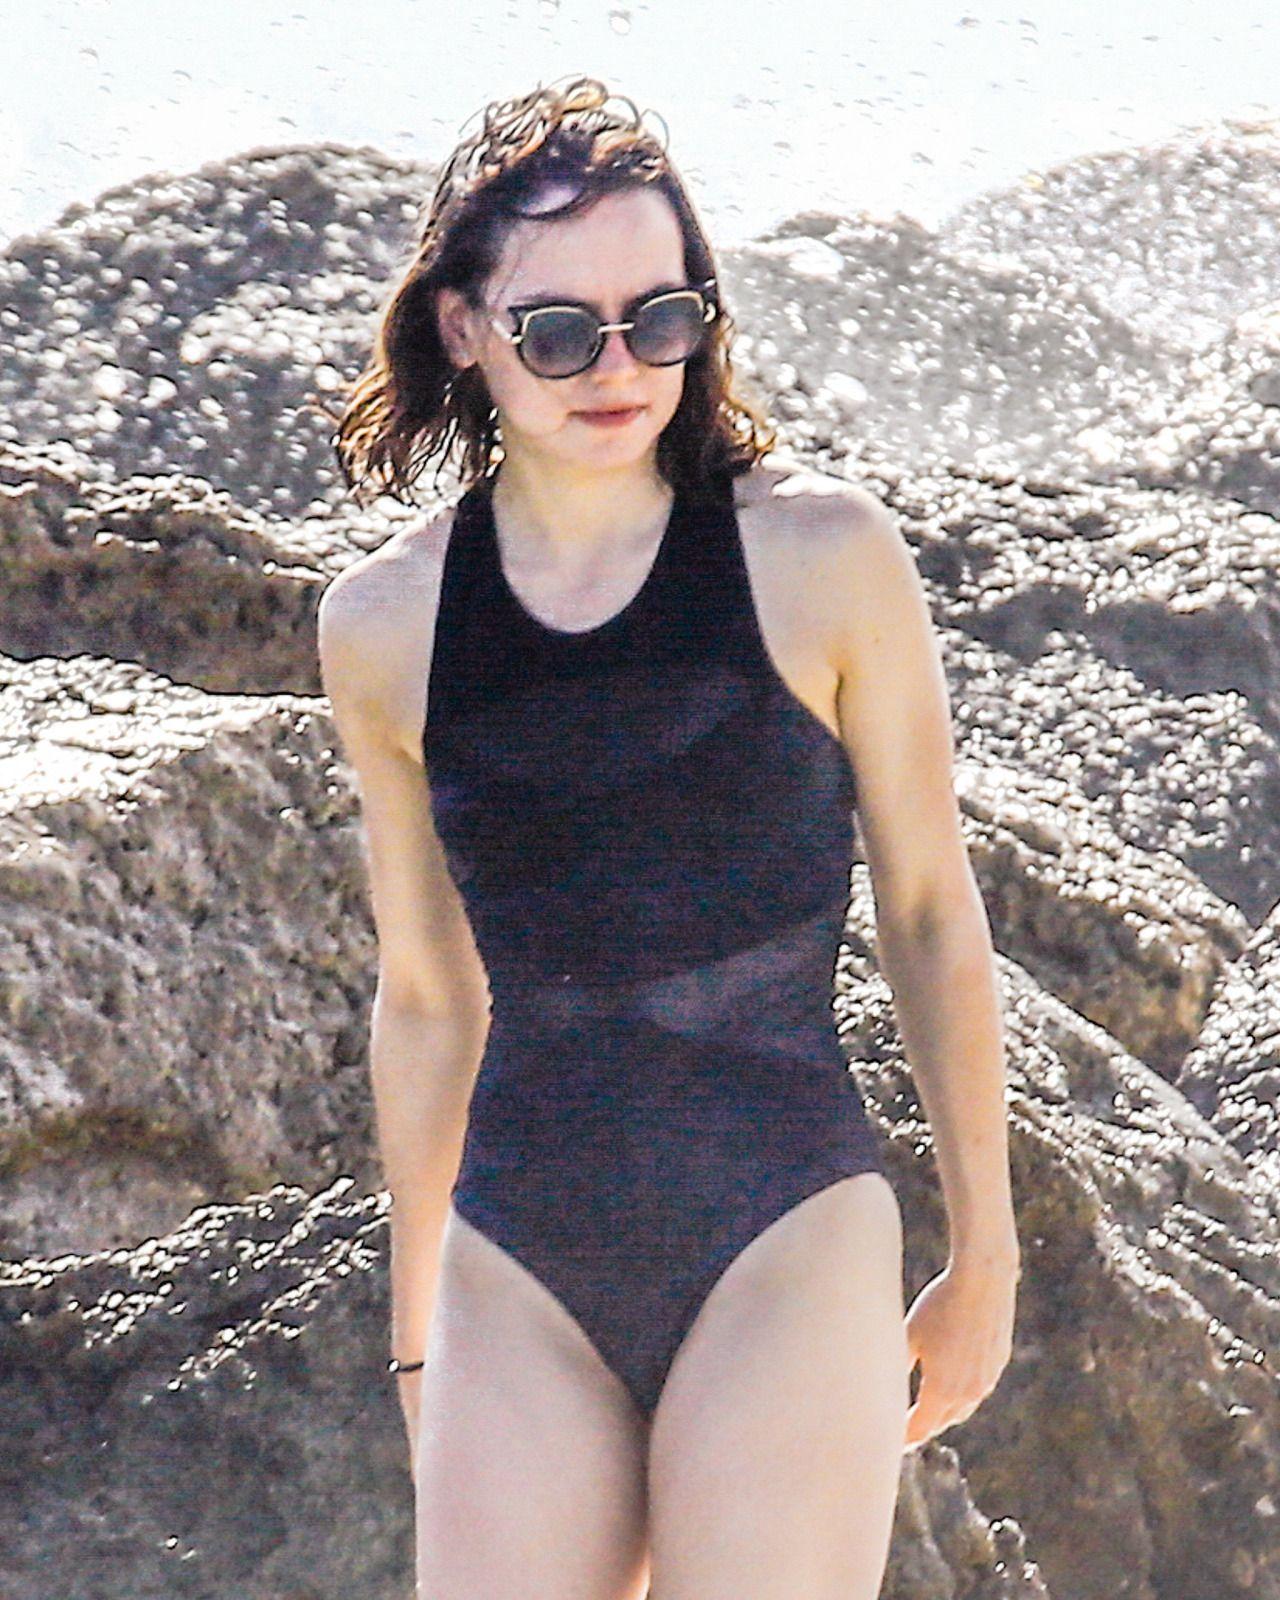 Bikini Daisy Ridley nudes (81 photo), Topless